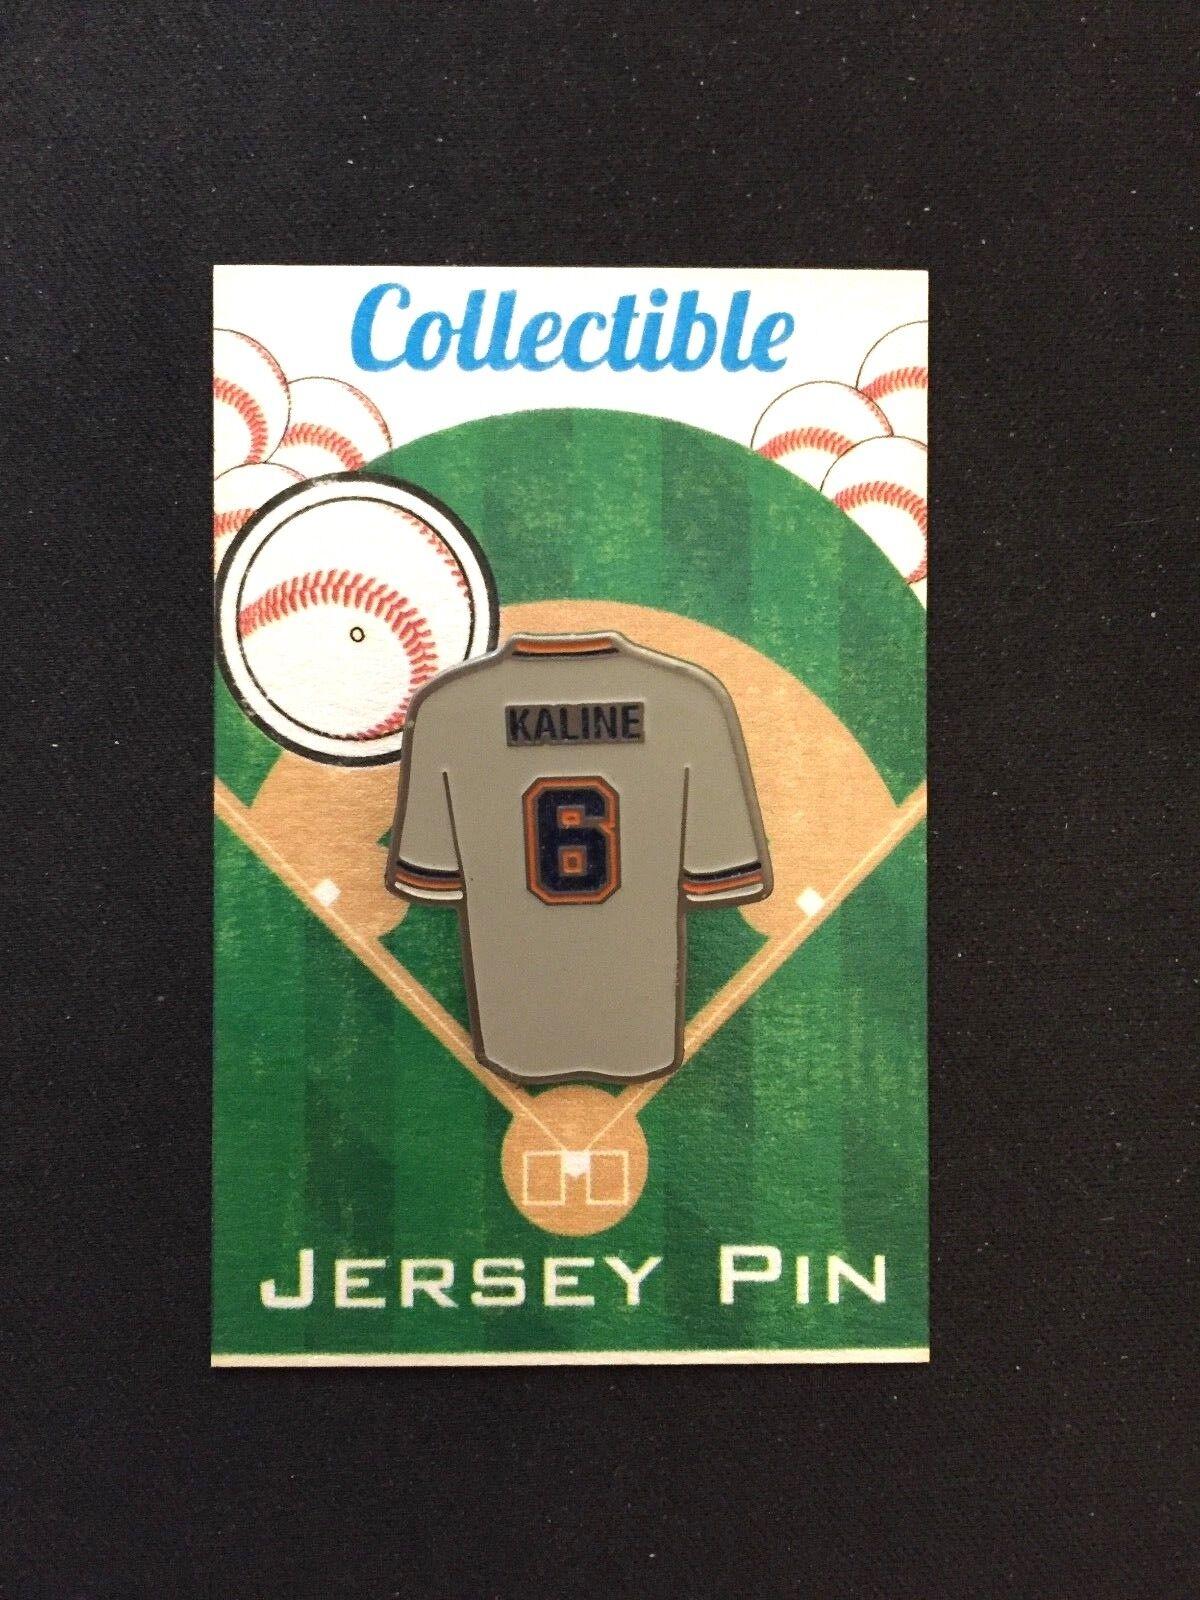 Detroit Tigers Al Kaline jersey lapel pin-Classic Retro Collectible- Mr. Tiger